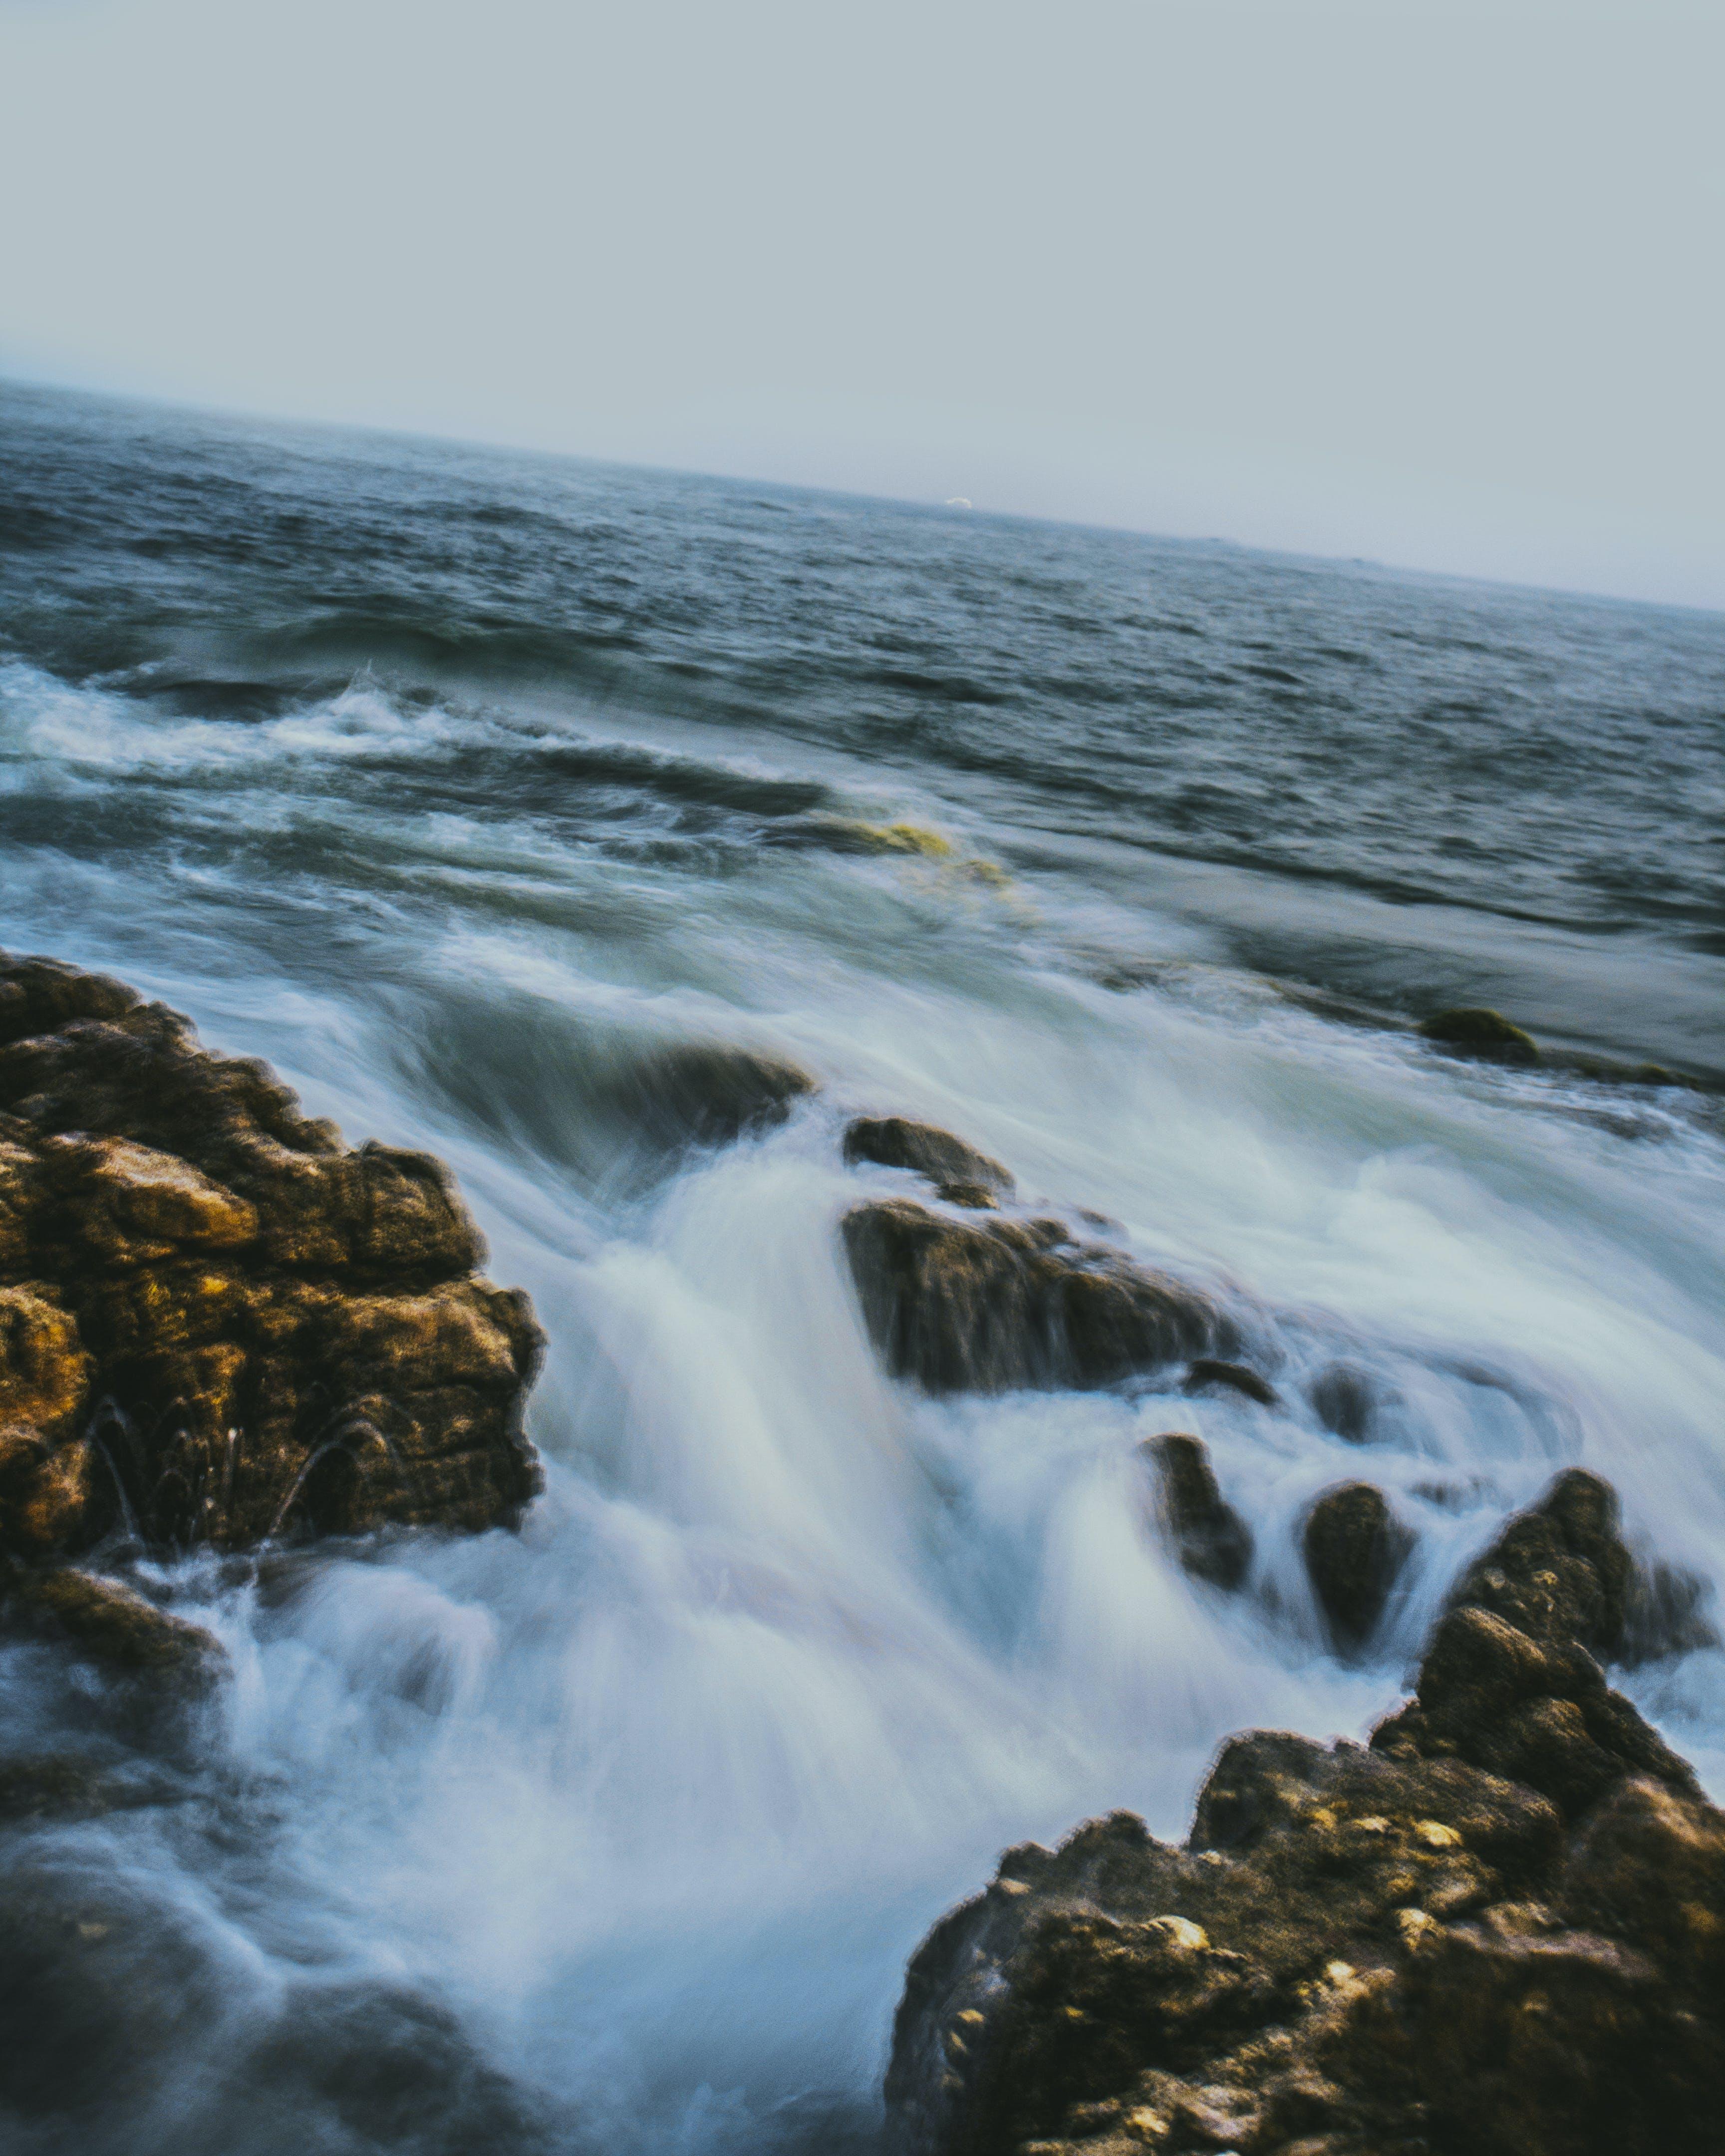 Free stock photo of abstract photo, Adobe Photoshop, adriatic sea, Baltic Sea